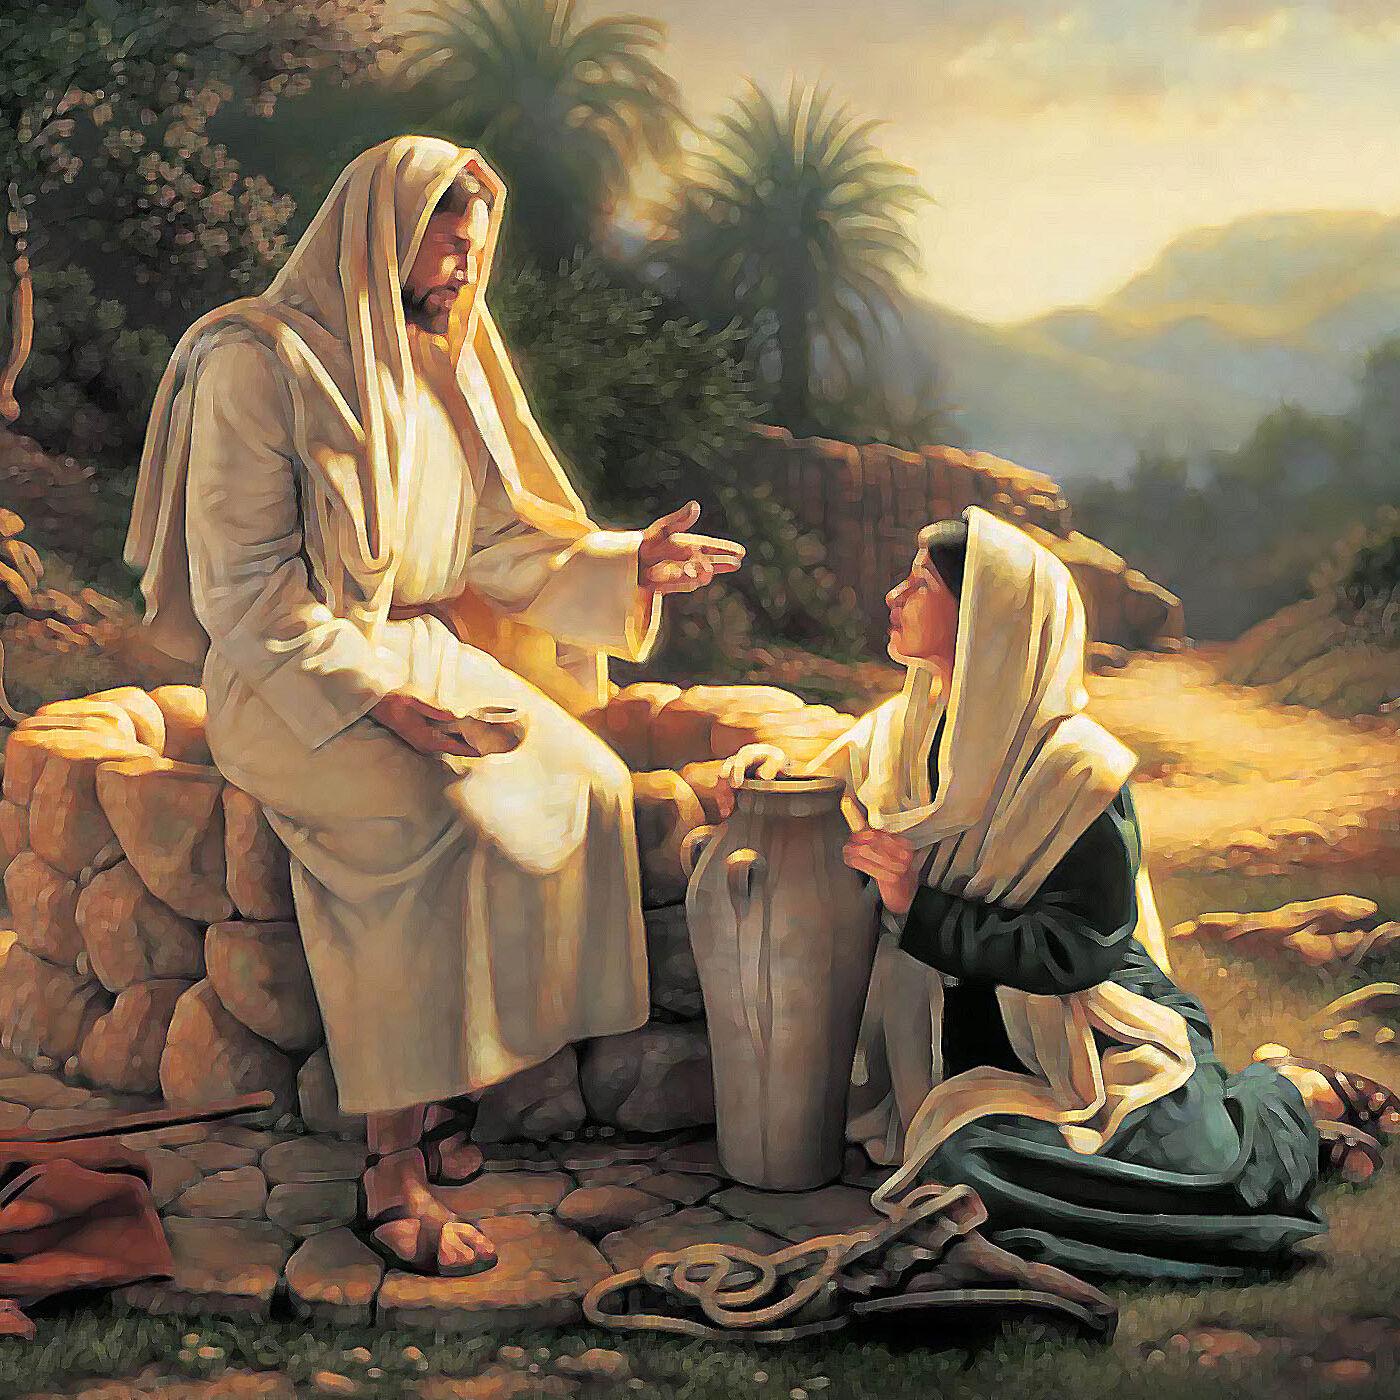 riflessioni sul Vangelo di Mercoledì 31 Marzo 2021 (Mt 26, 14-25)